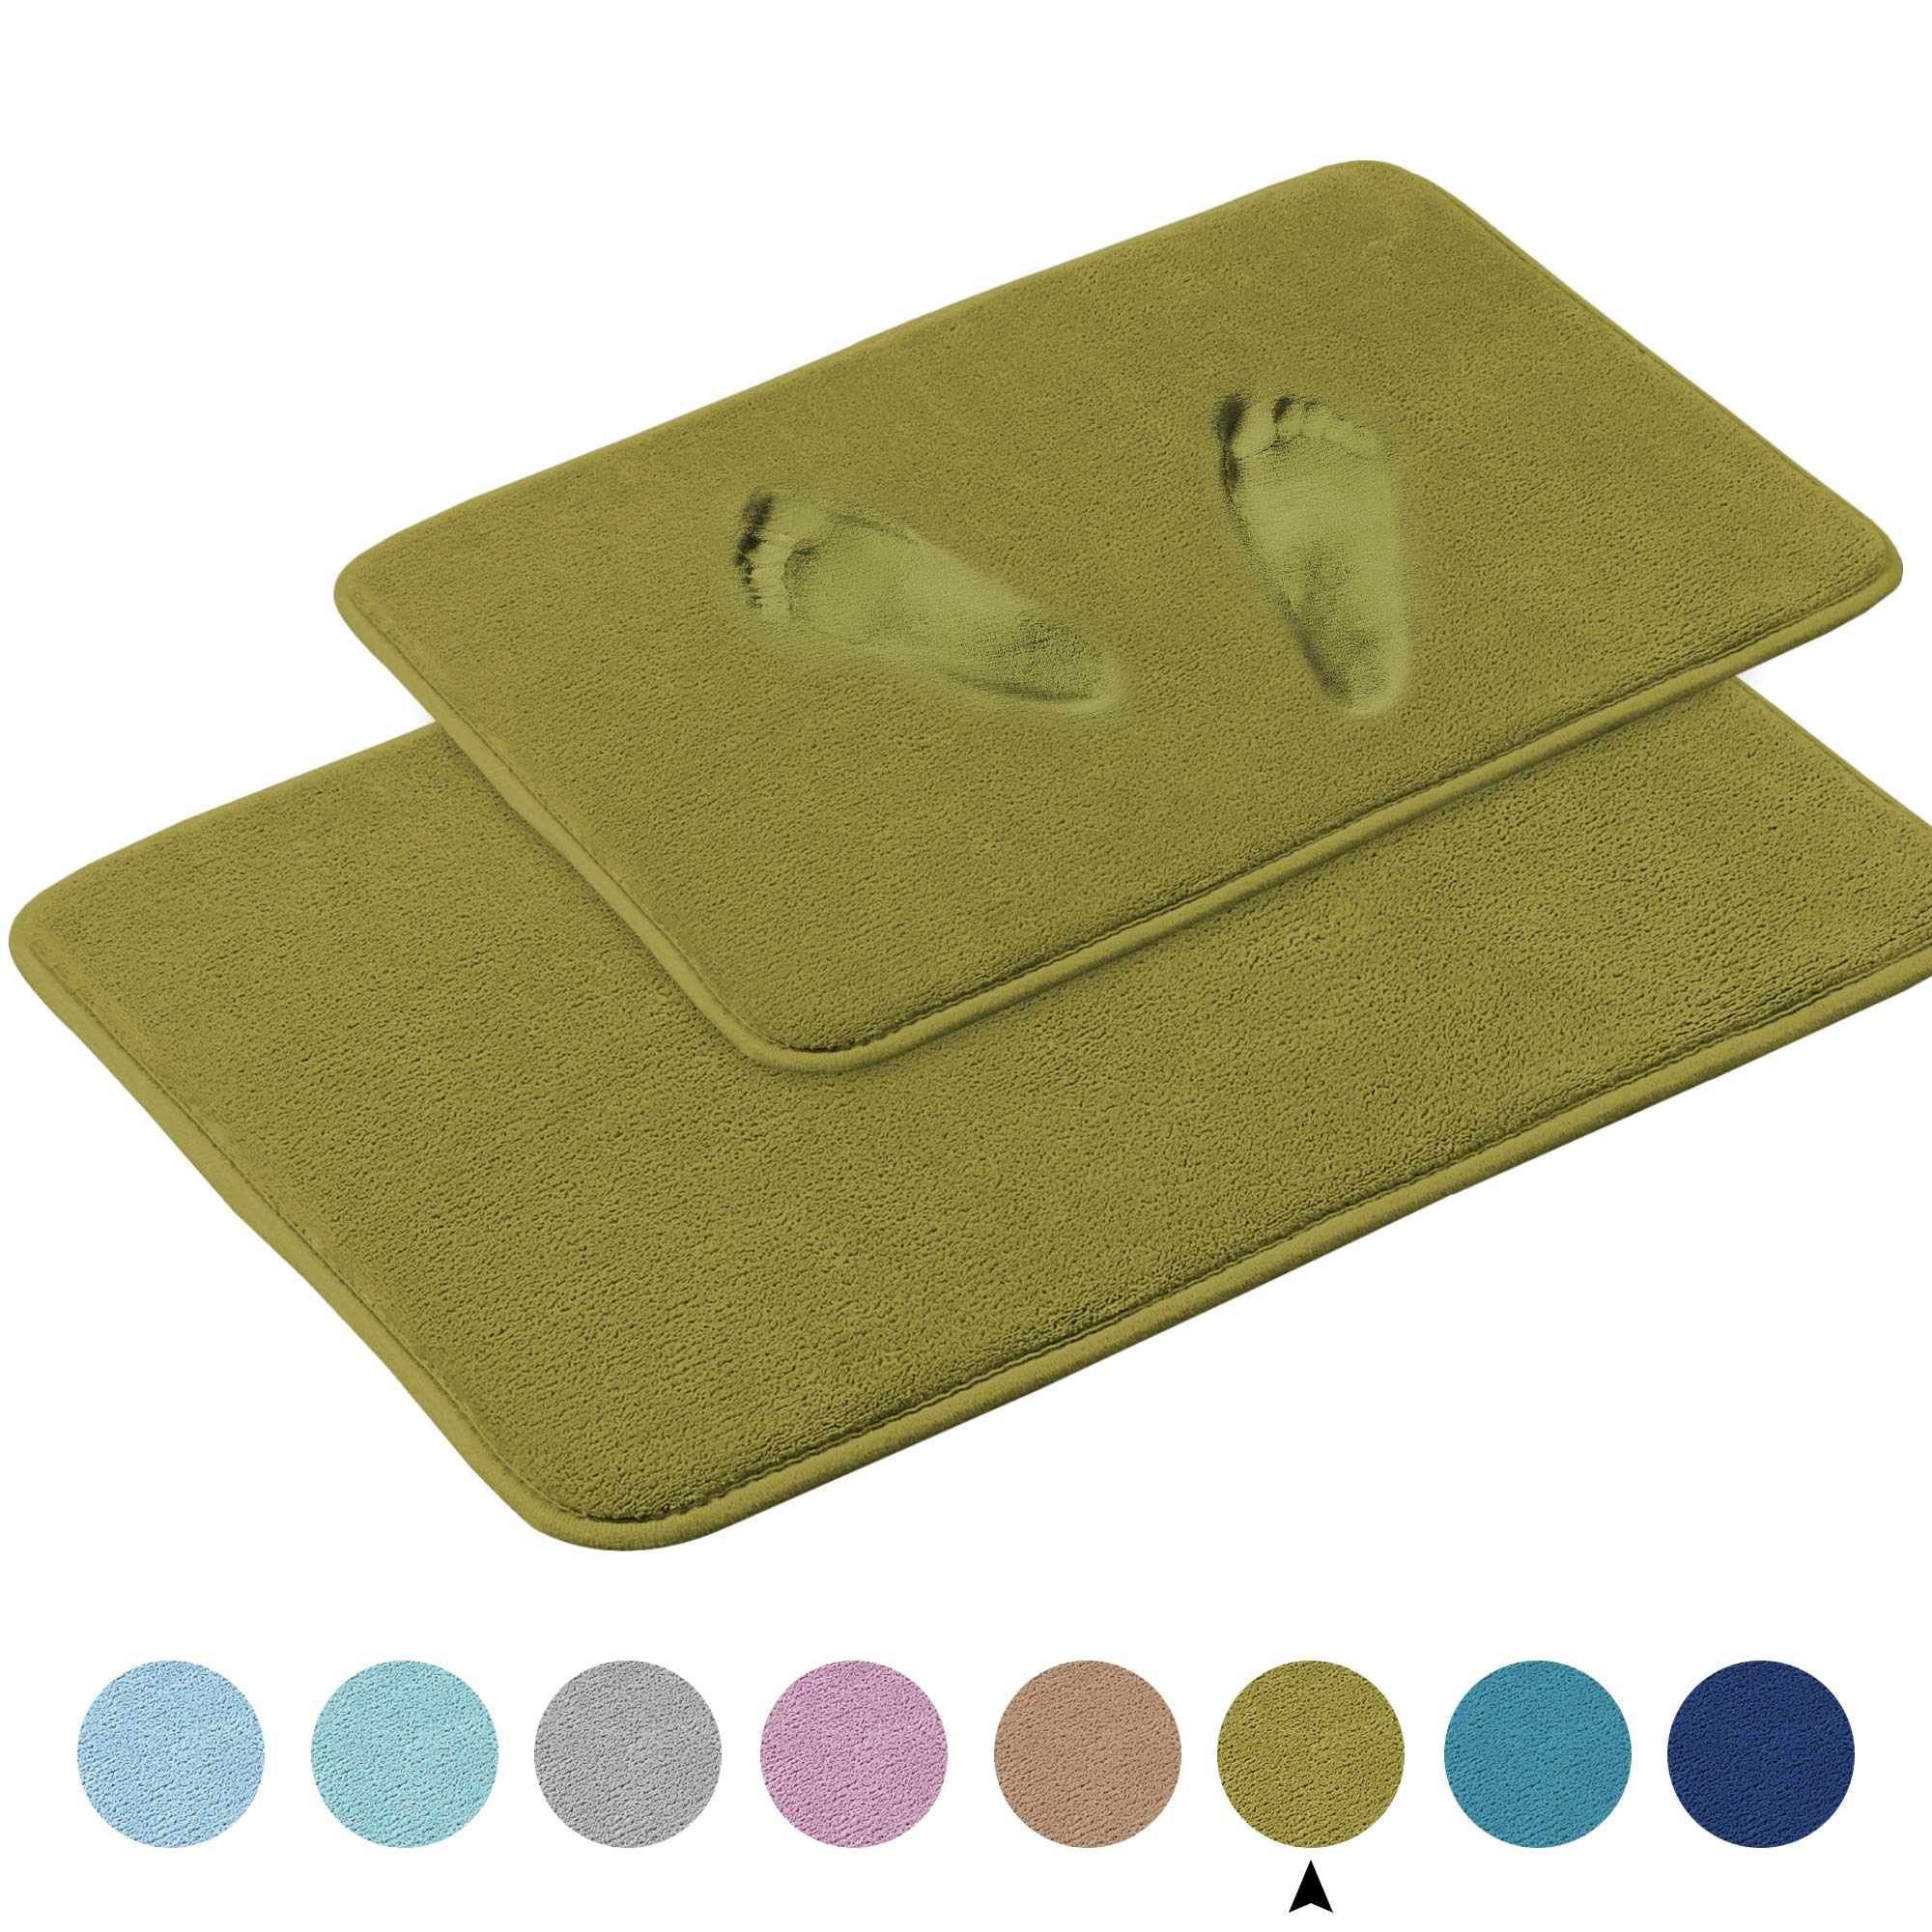 "Soft Memory Foam Non Slip Super-Absorbent Bath Mat Toilet Floor Rug Flannel Fleece Microfiber Velvety Plush Shower Rugs for Bathroom, Machine-Washable(2 Packs-20"" x 32""/ 17"" x 24"", Olive"